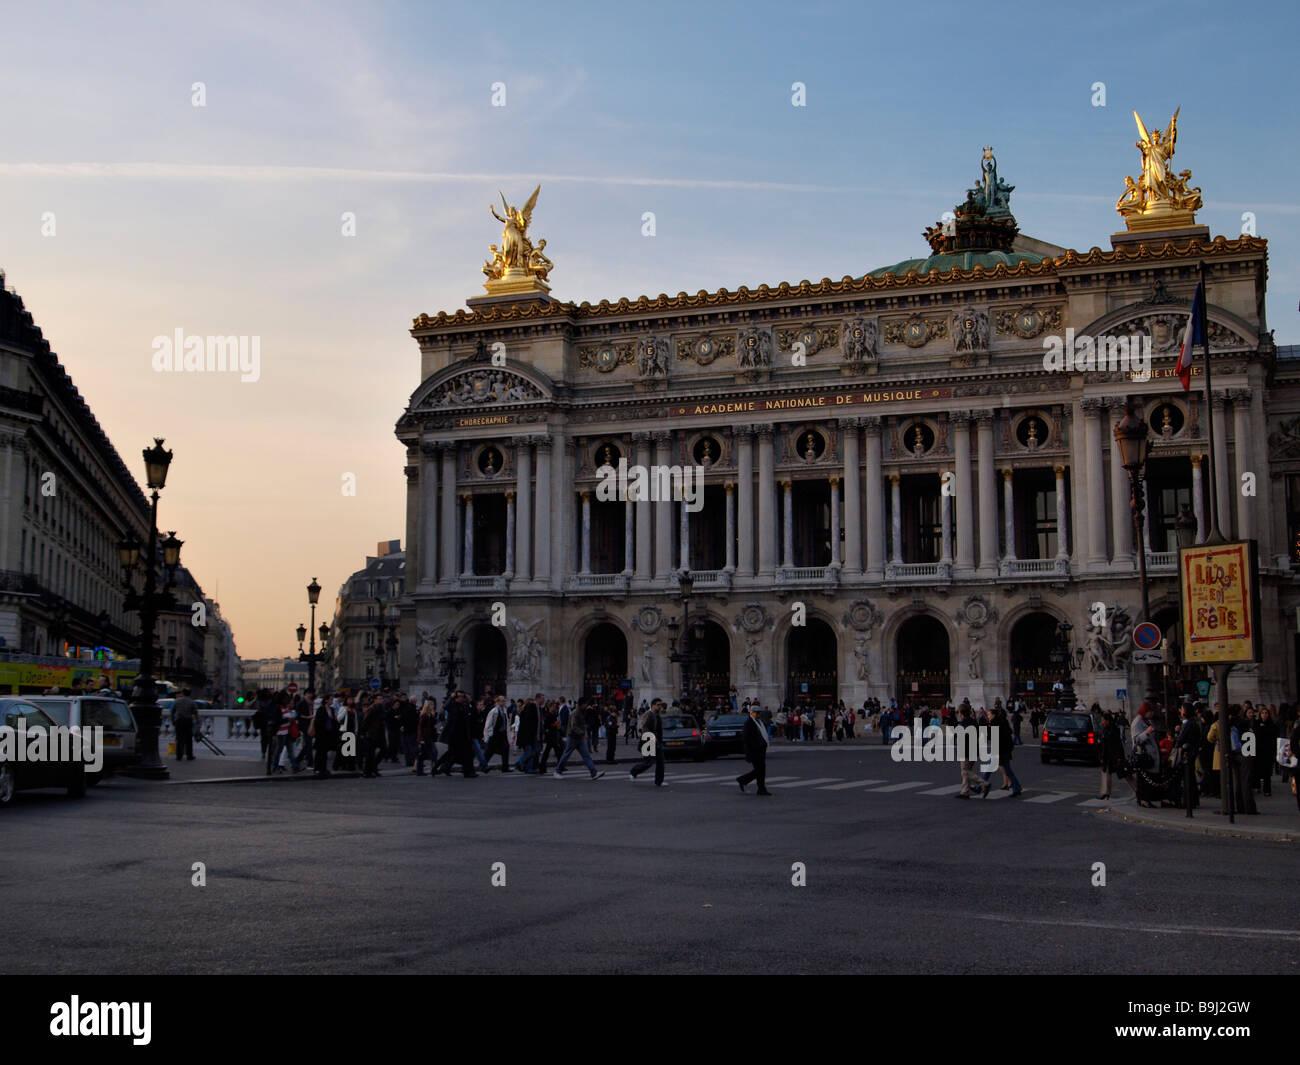 Opera Garnier, old opera and Place de l'Opera, Paris, France, Europe - Stock Image